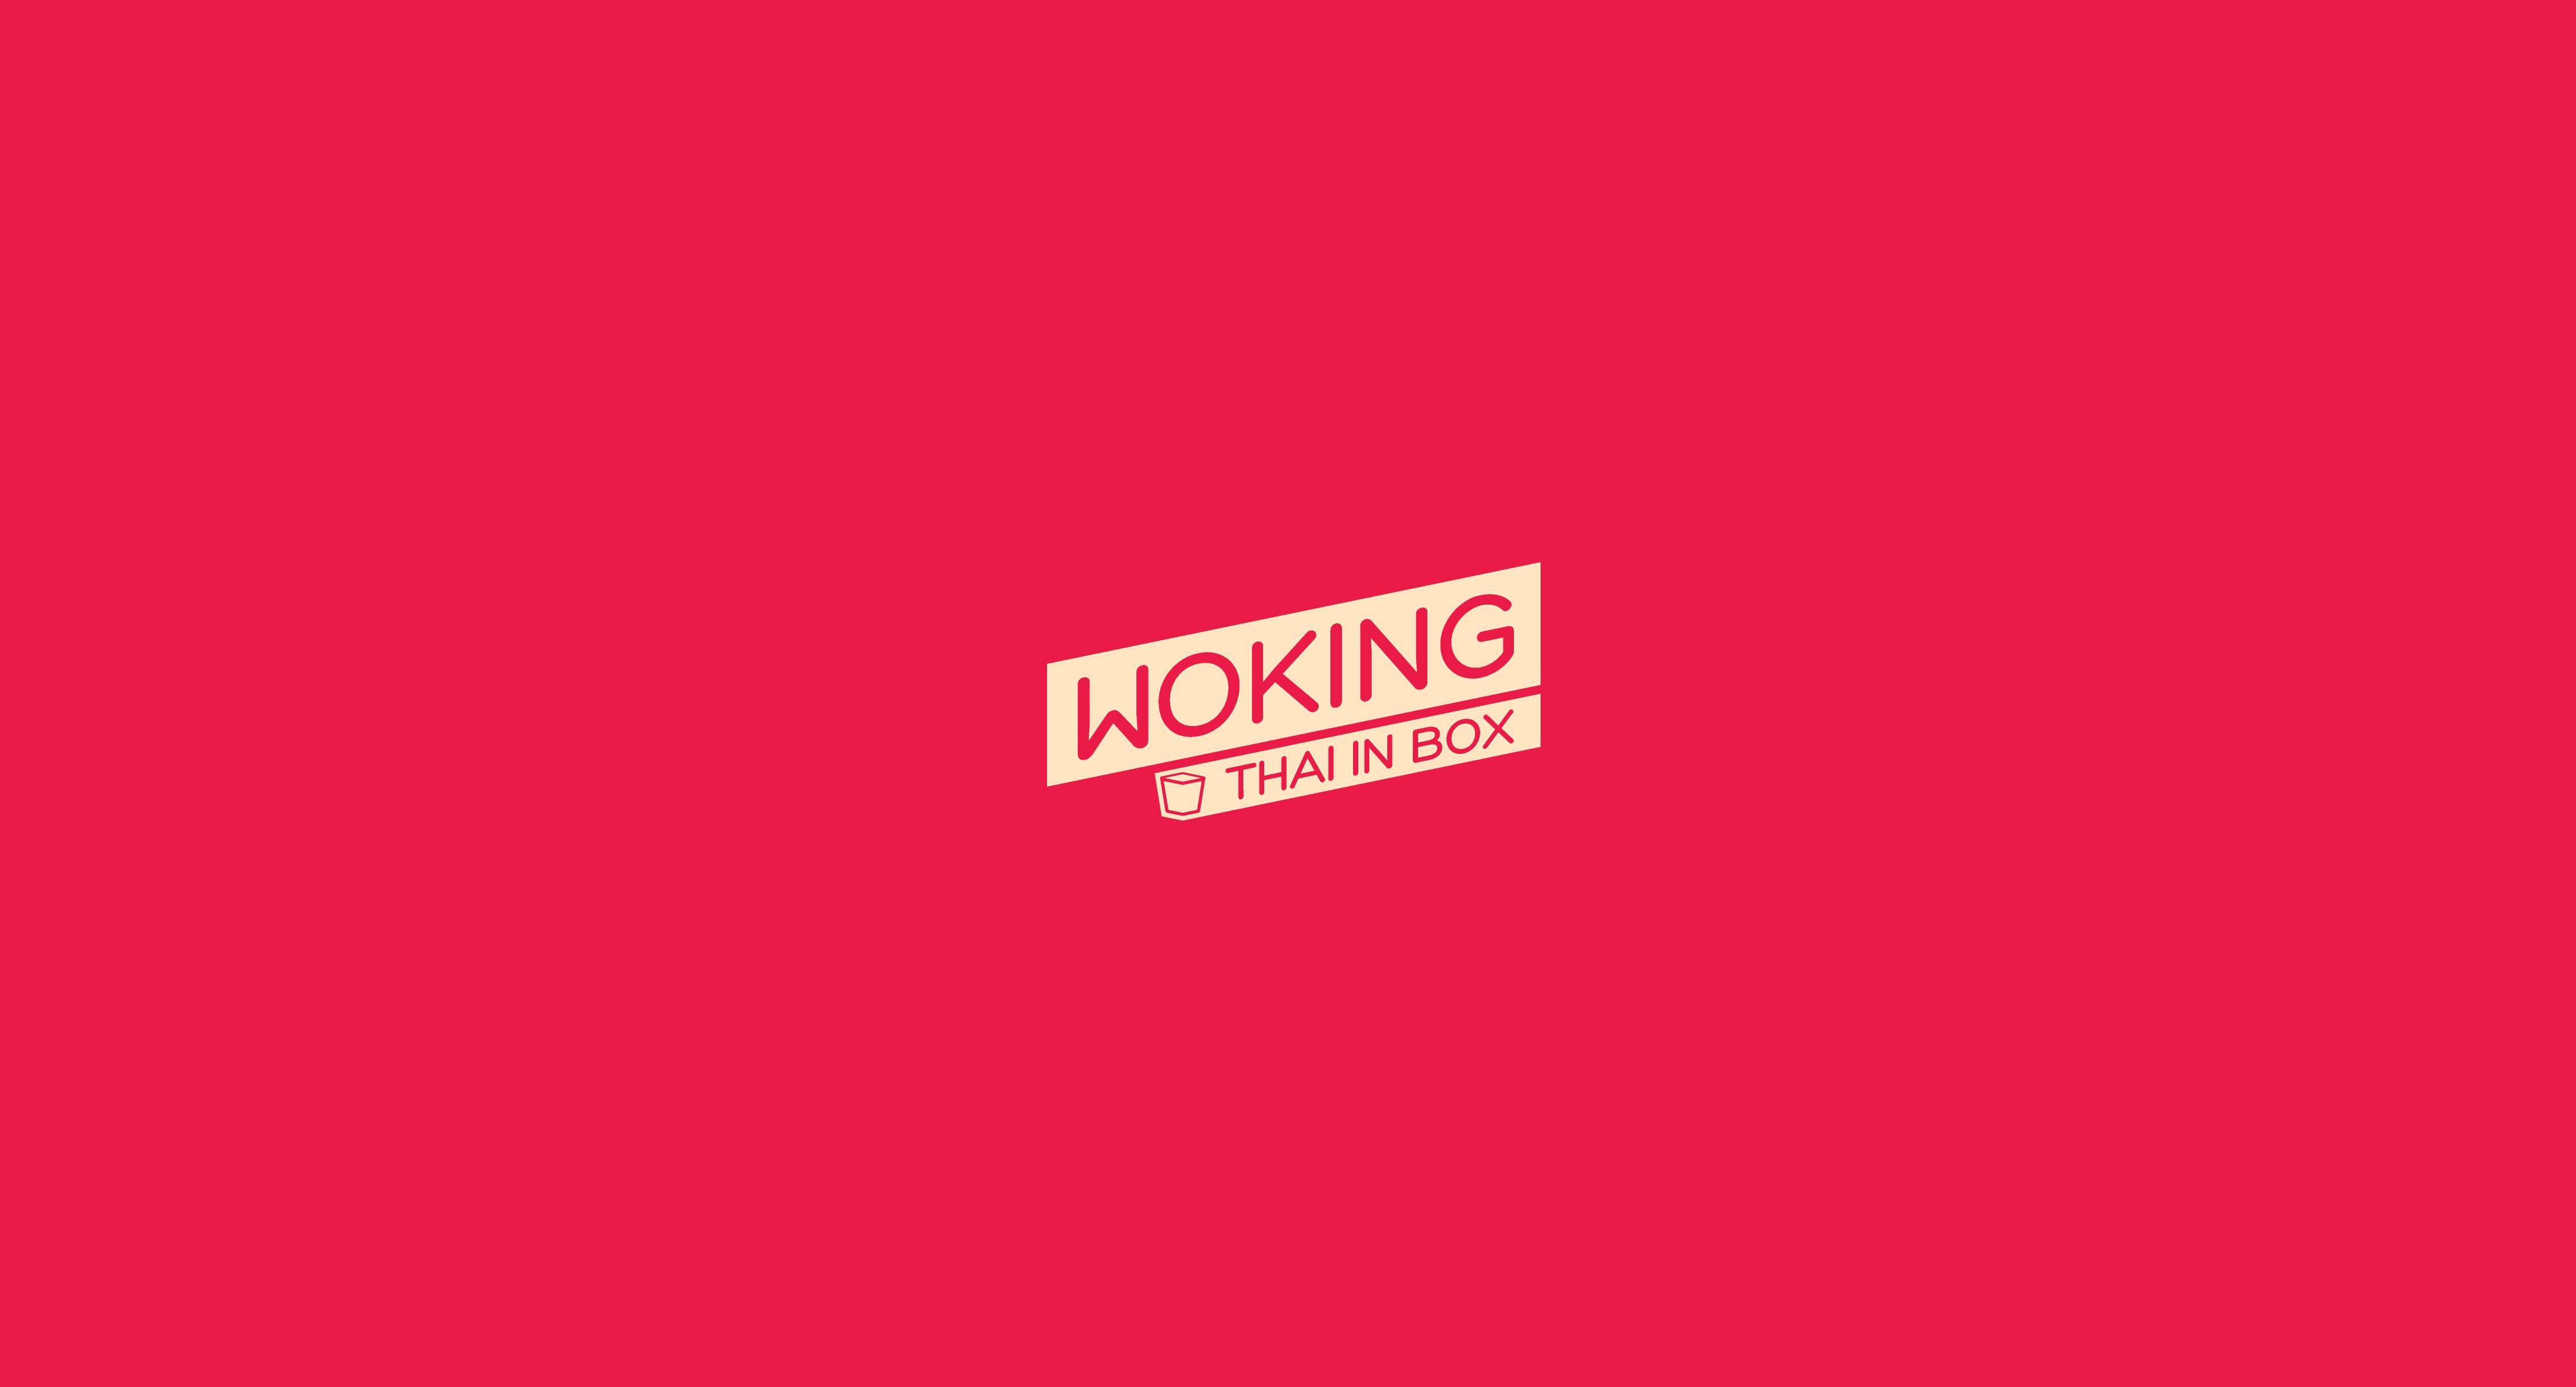 design-marca-branding-woking-valkiria-008